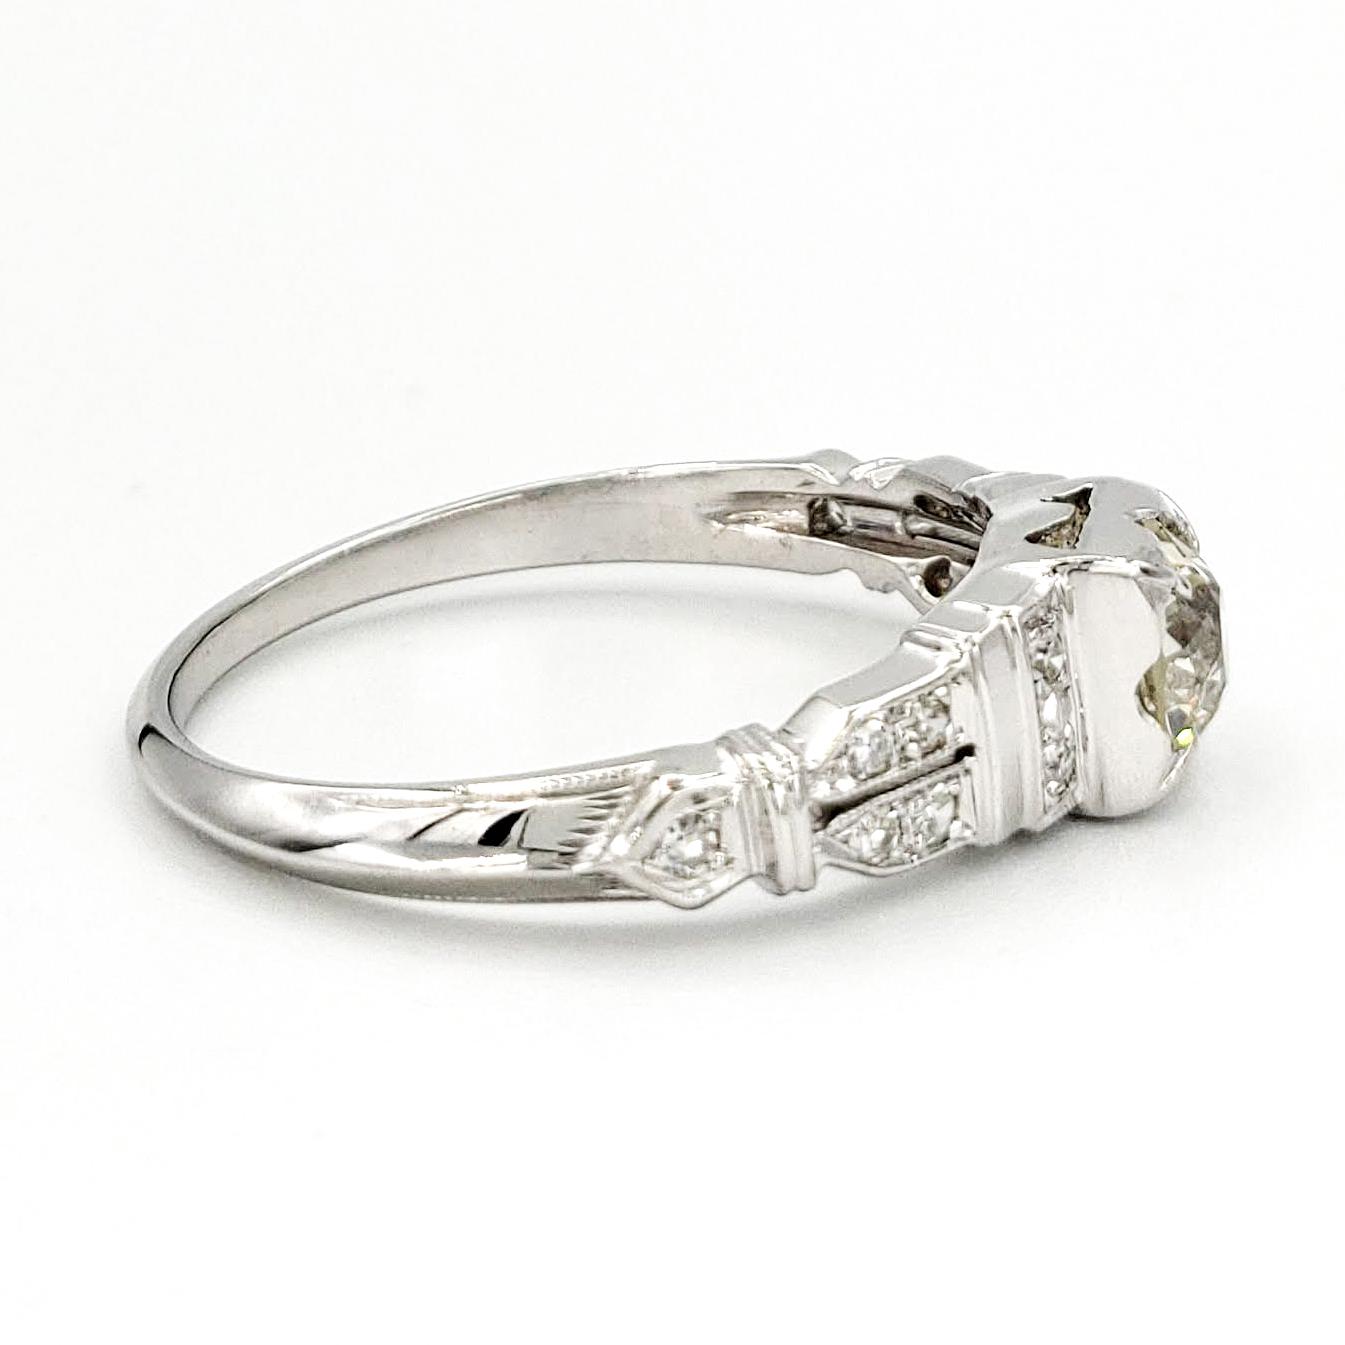 vintage-18-karat-gold-engagement-ring-with-0-51-carat-old-european-cut-diamond-egl-l-vs2